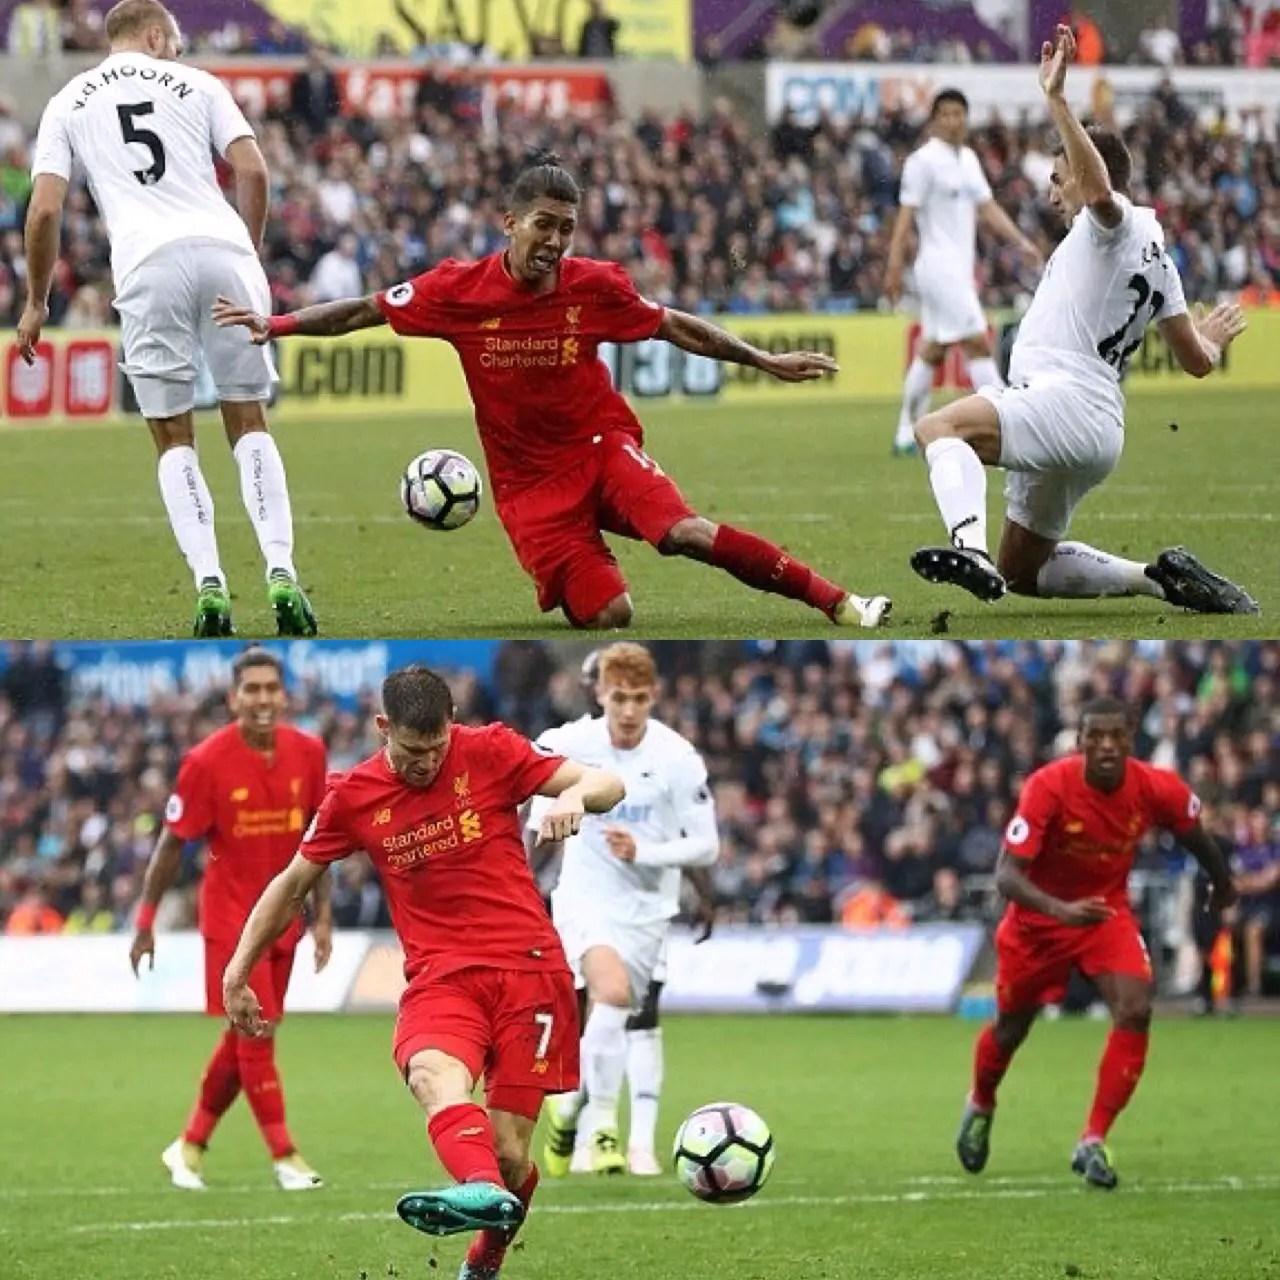 Firmino, Milner Score As Liverpool Edge Swansea